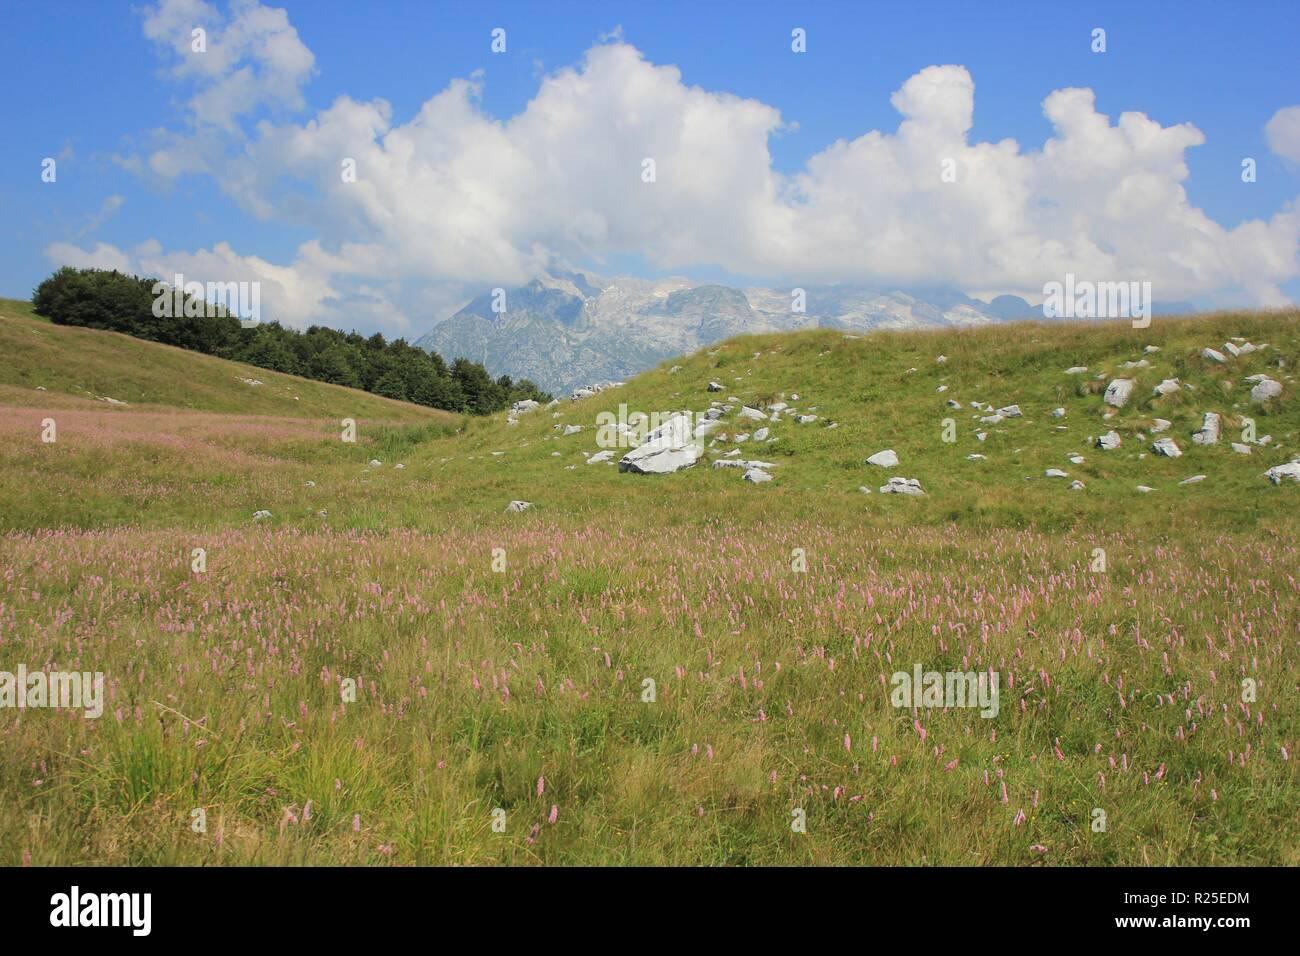 Colorful alpine meadow, Mount Kobariski Stol, Julian Alps, Alpe Adria trail, Slovenia, central Europe - Stock Image